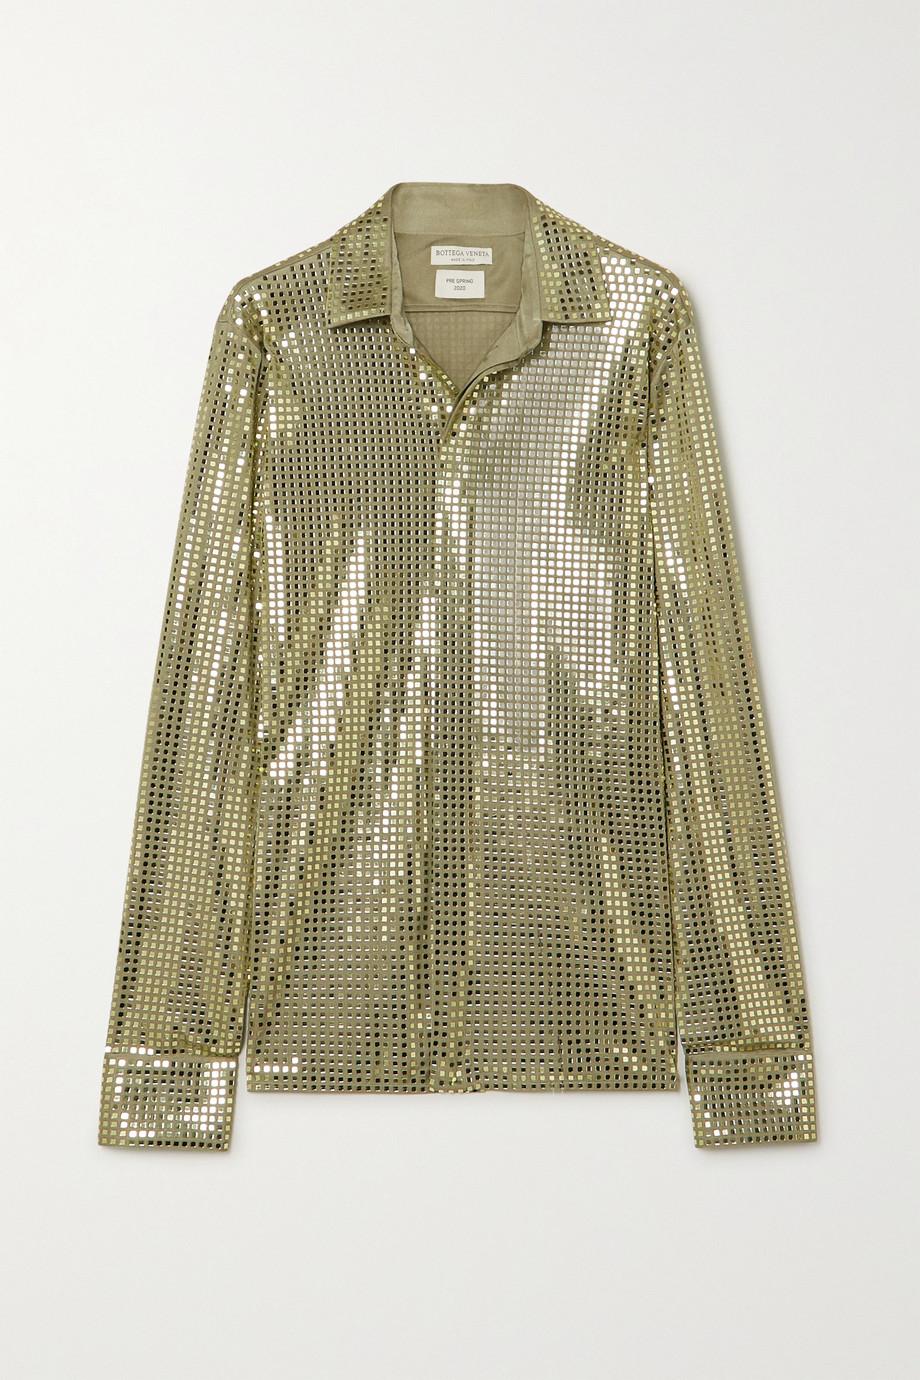 Bottega Veneta Sequin-embellished satin-jersey shirt